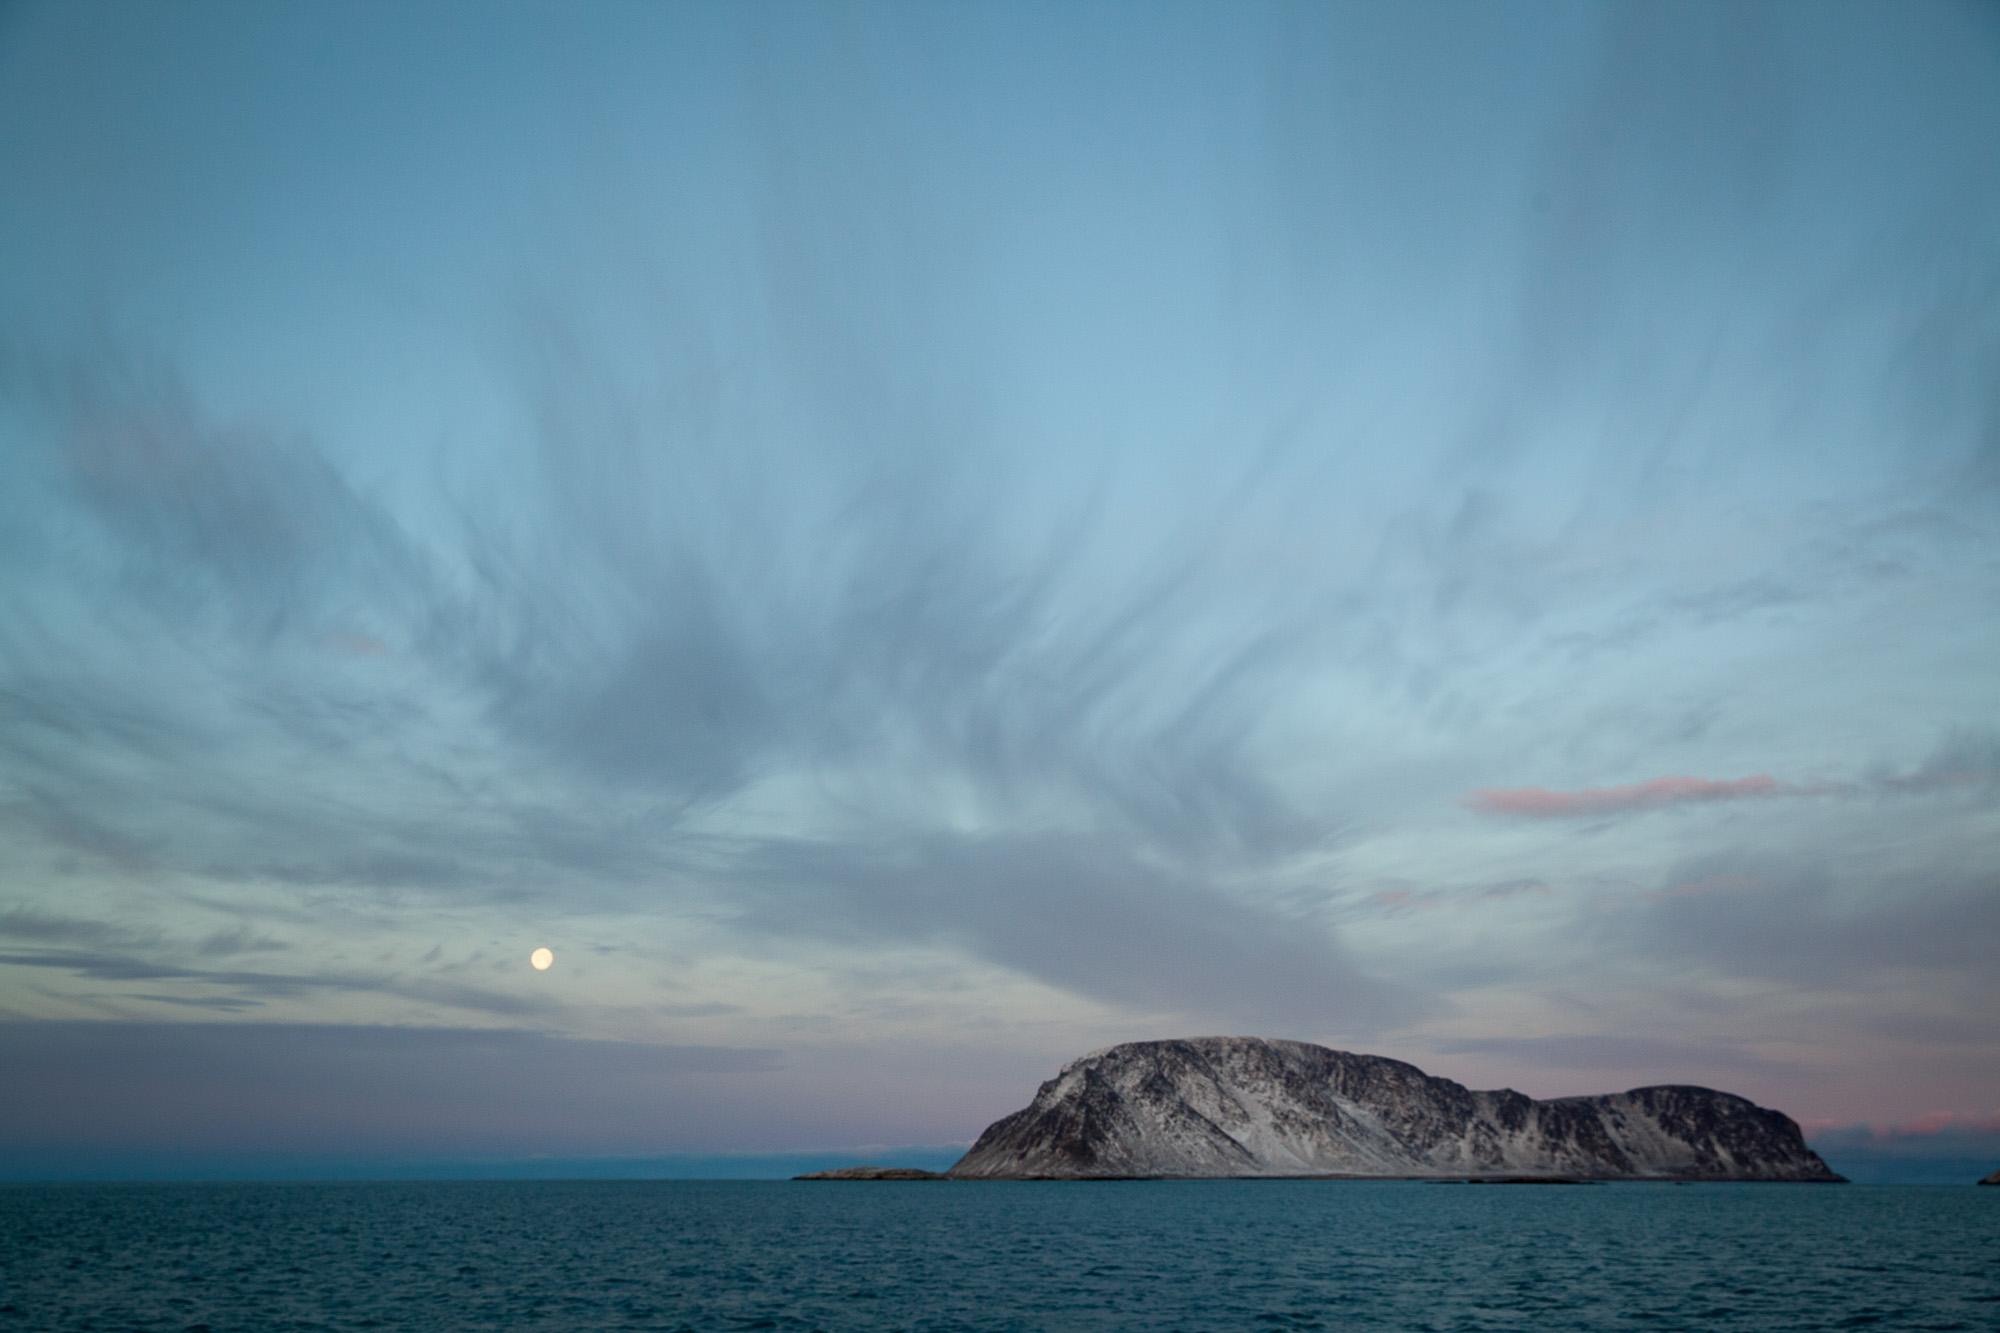 arctic-svalbard-2818.jpg